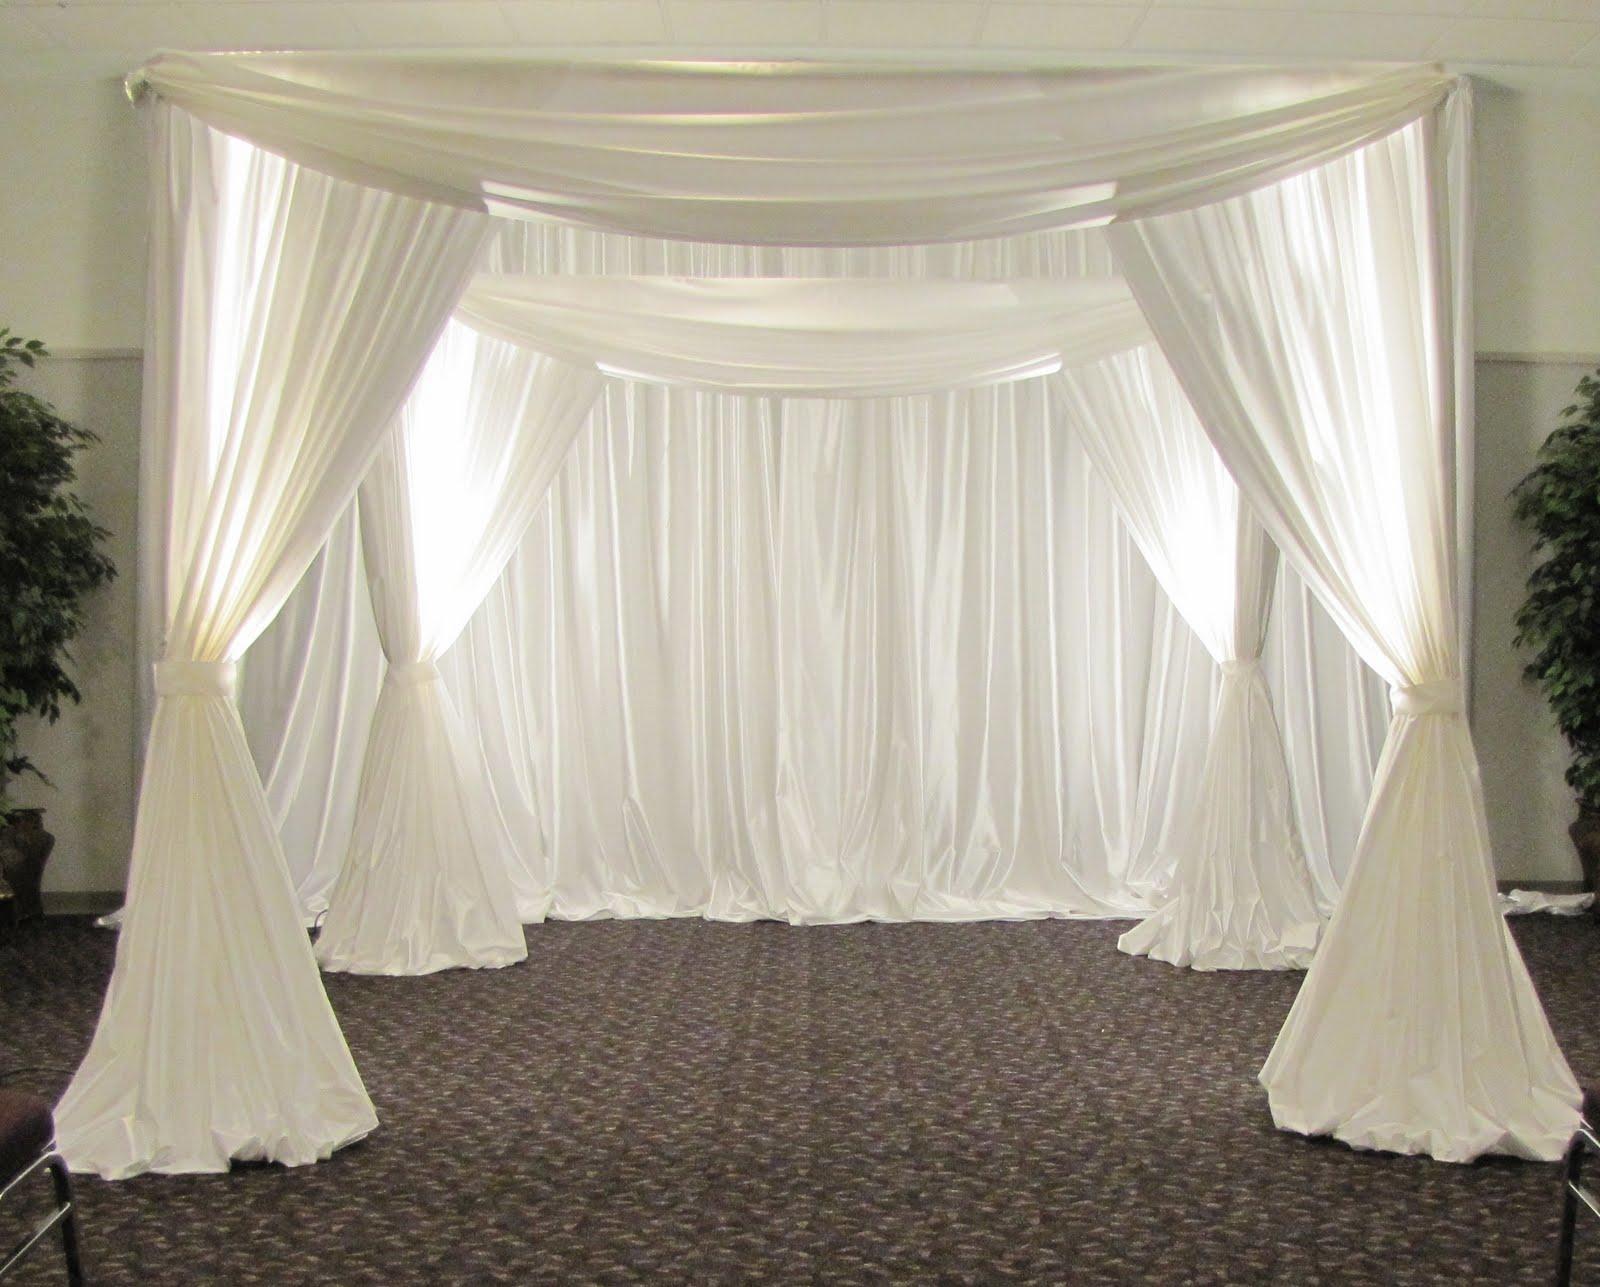 Jeetu Photo Studio & Full HD Videography : Studio Wallpapers Wedding Studio Background Wallpaper